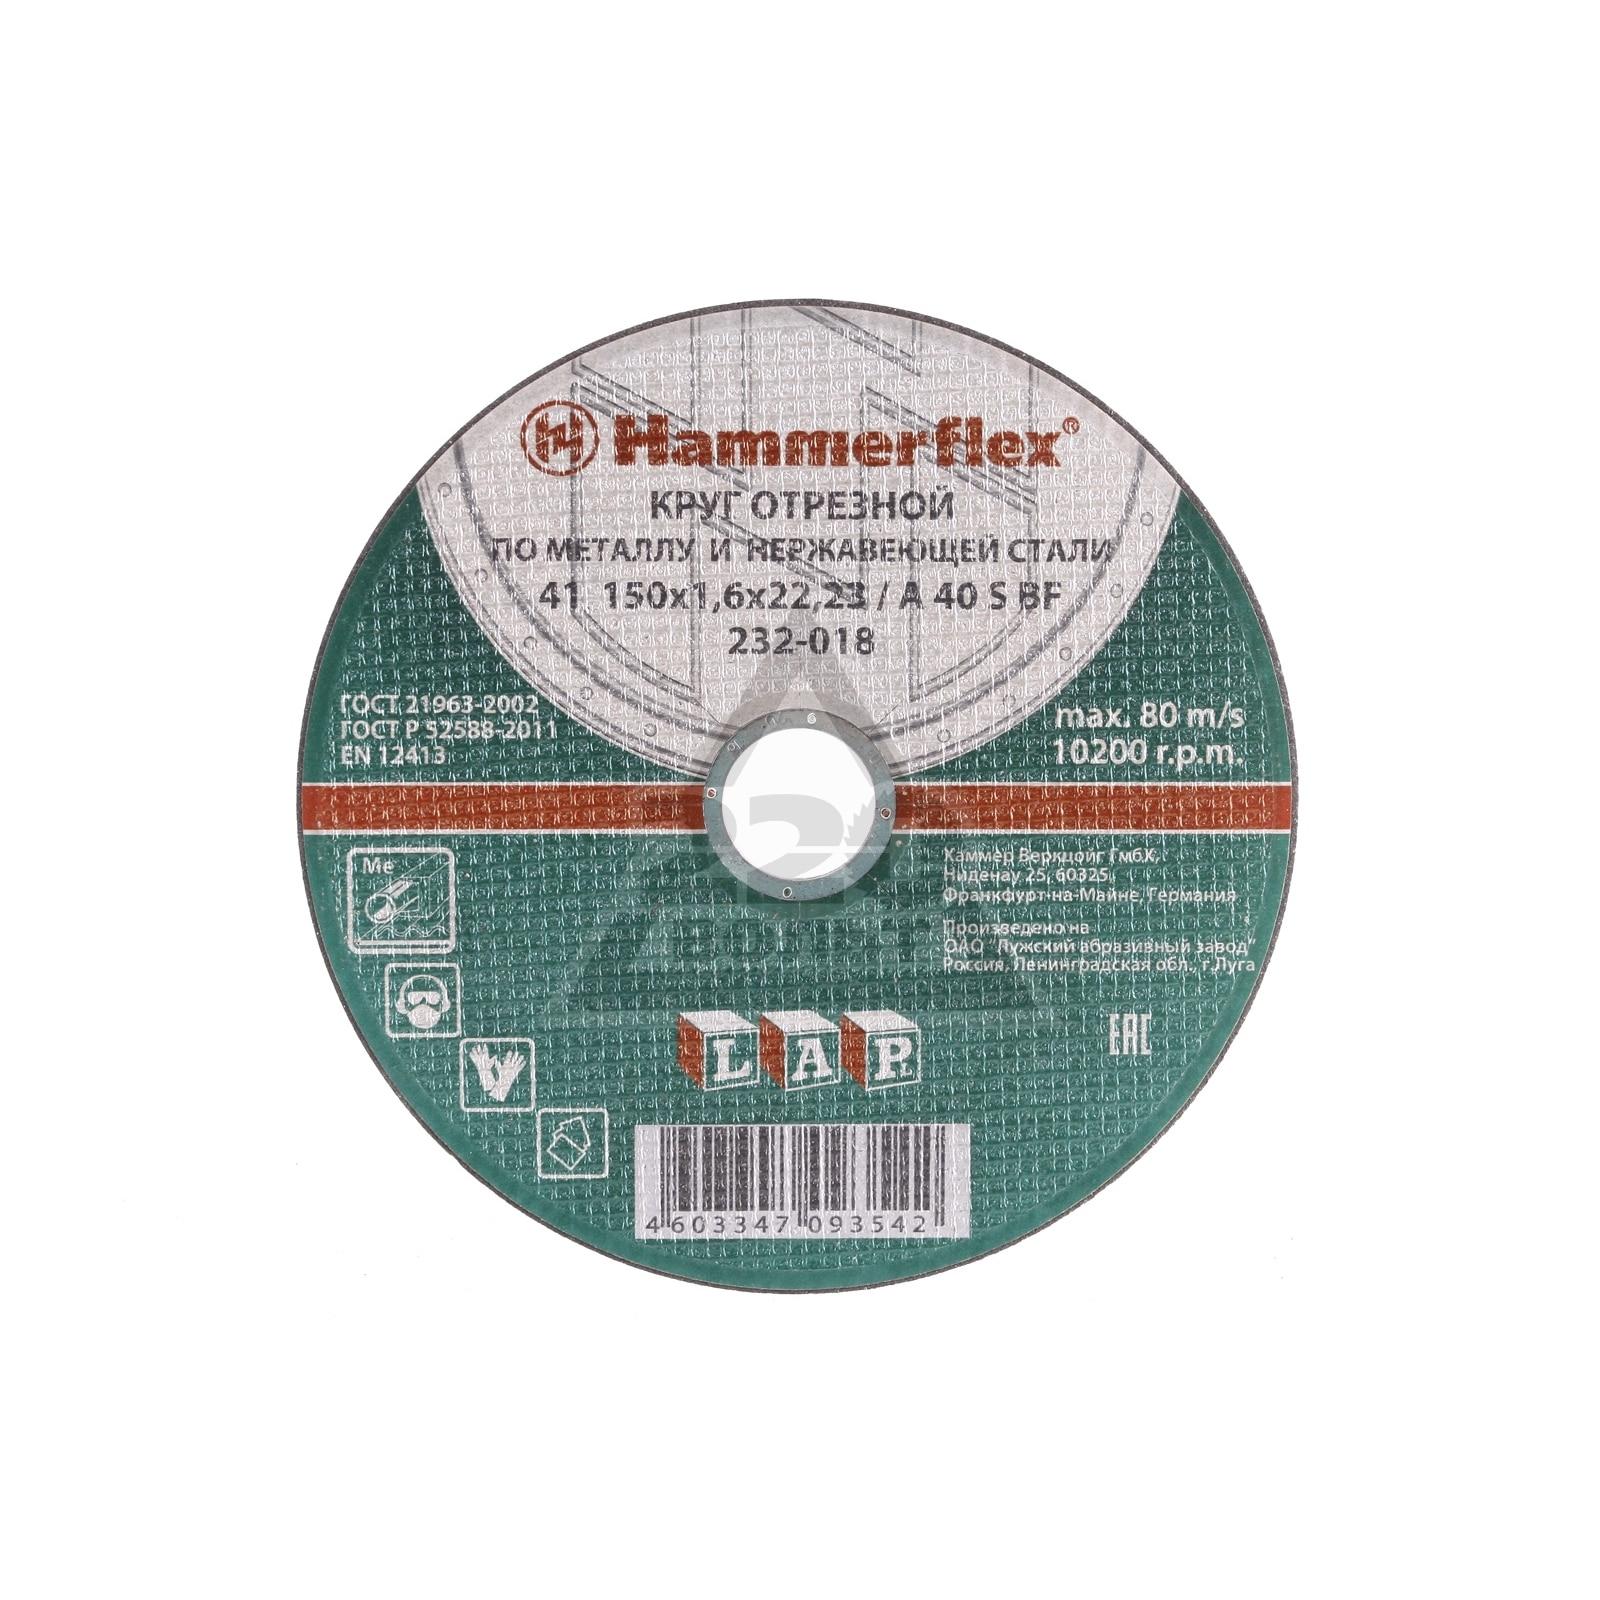 Circle Cutting HAMMER 150х1. 6x22 Pcs. 25 Pcs